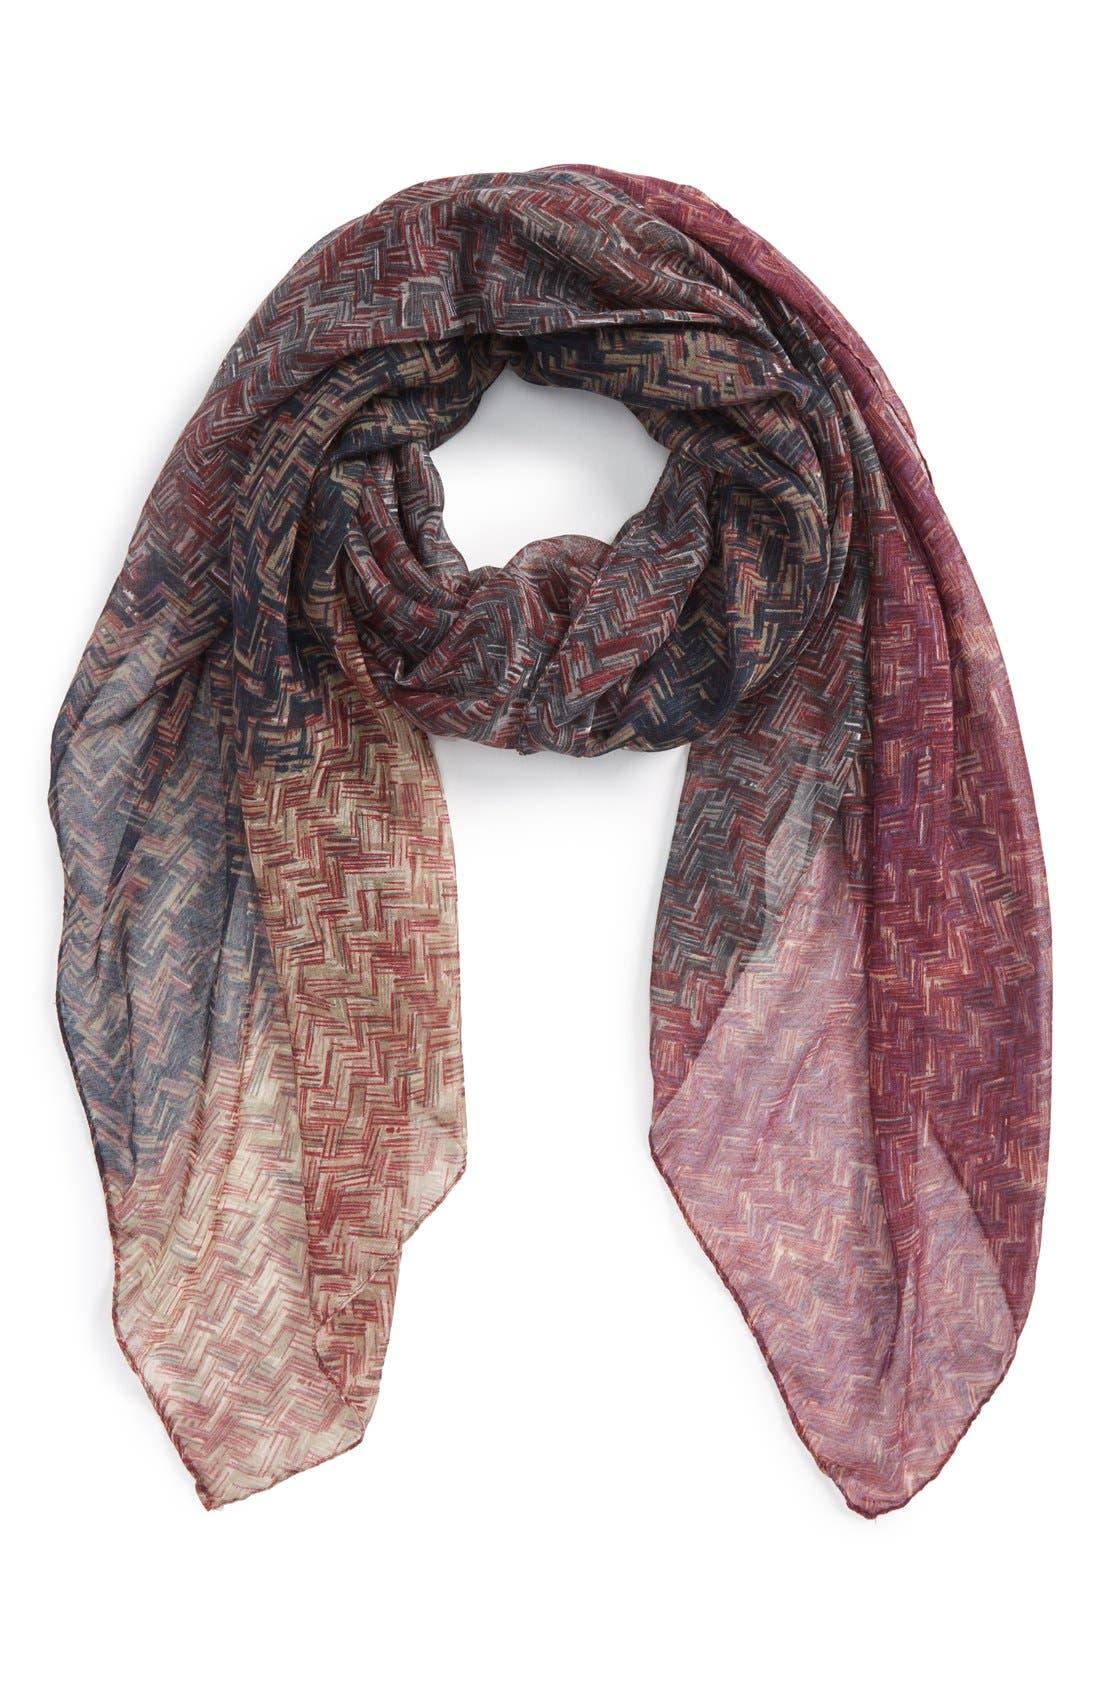 Alternate Image 1 Selected - TashaOmbré Woven PrintScarf